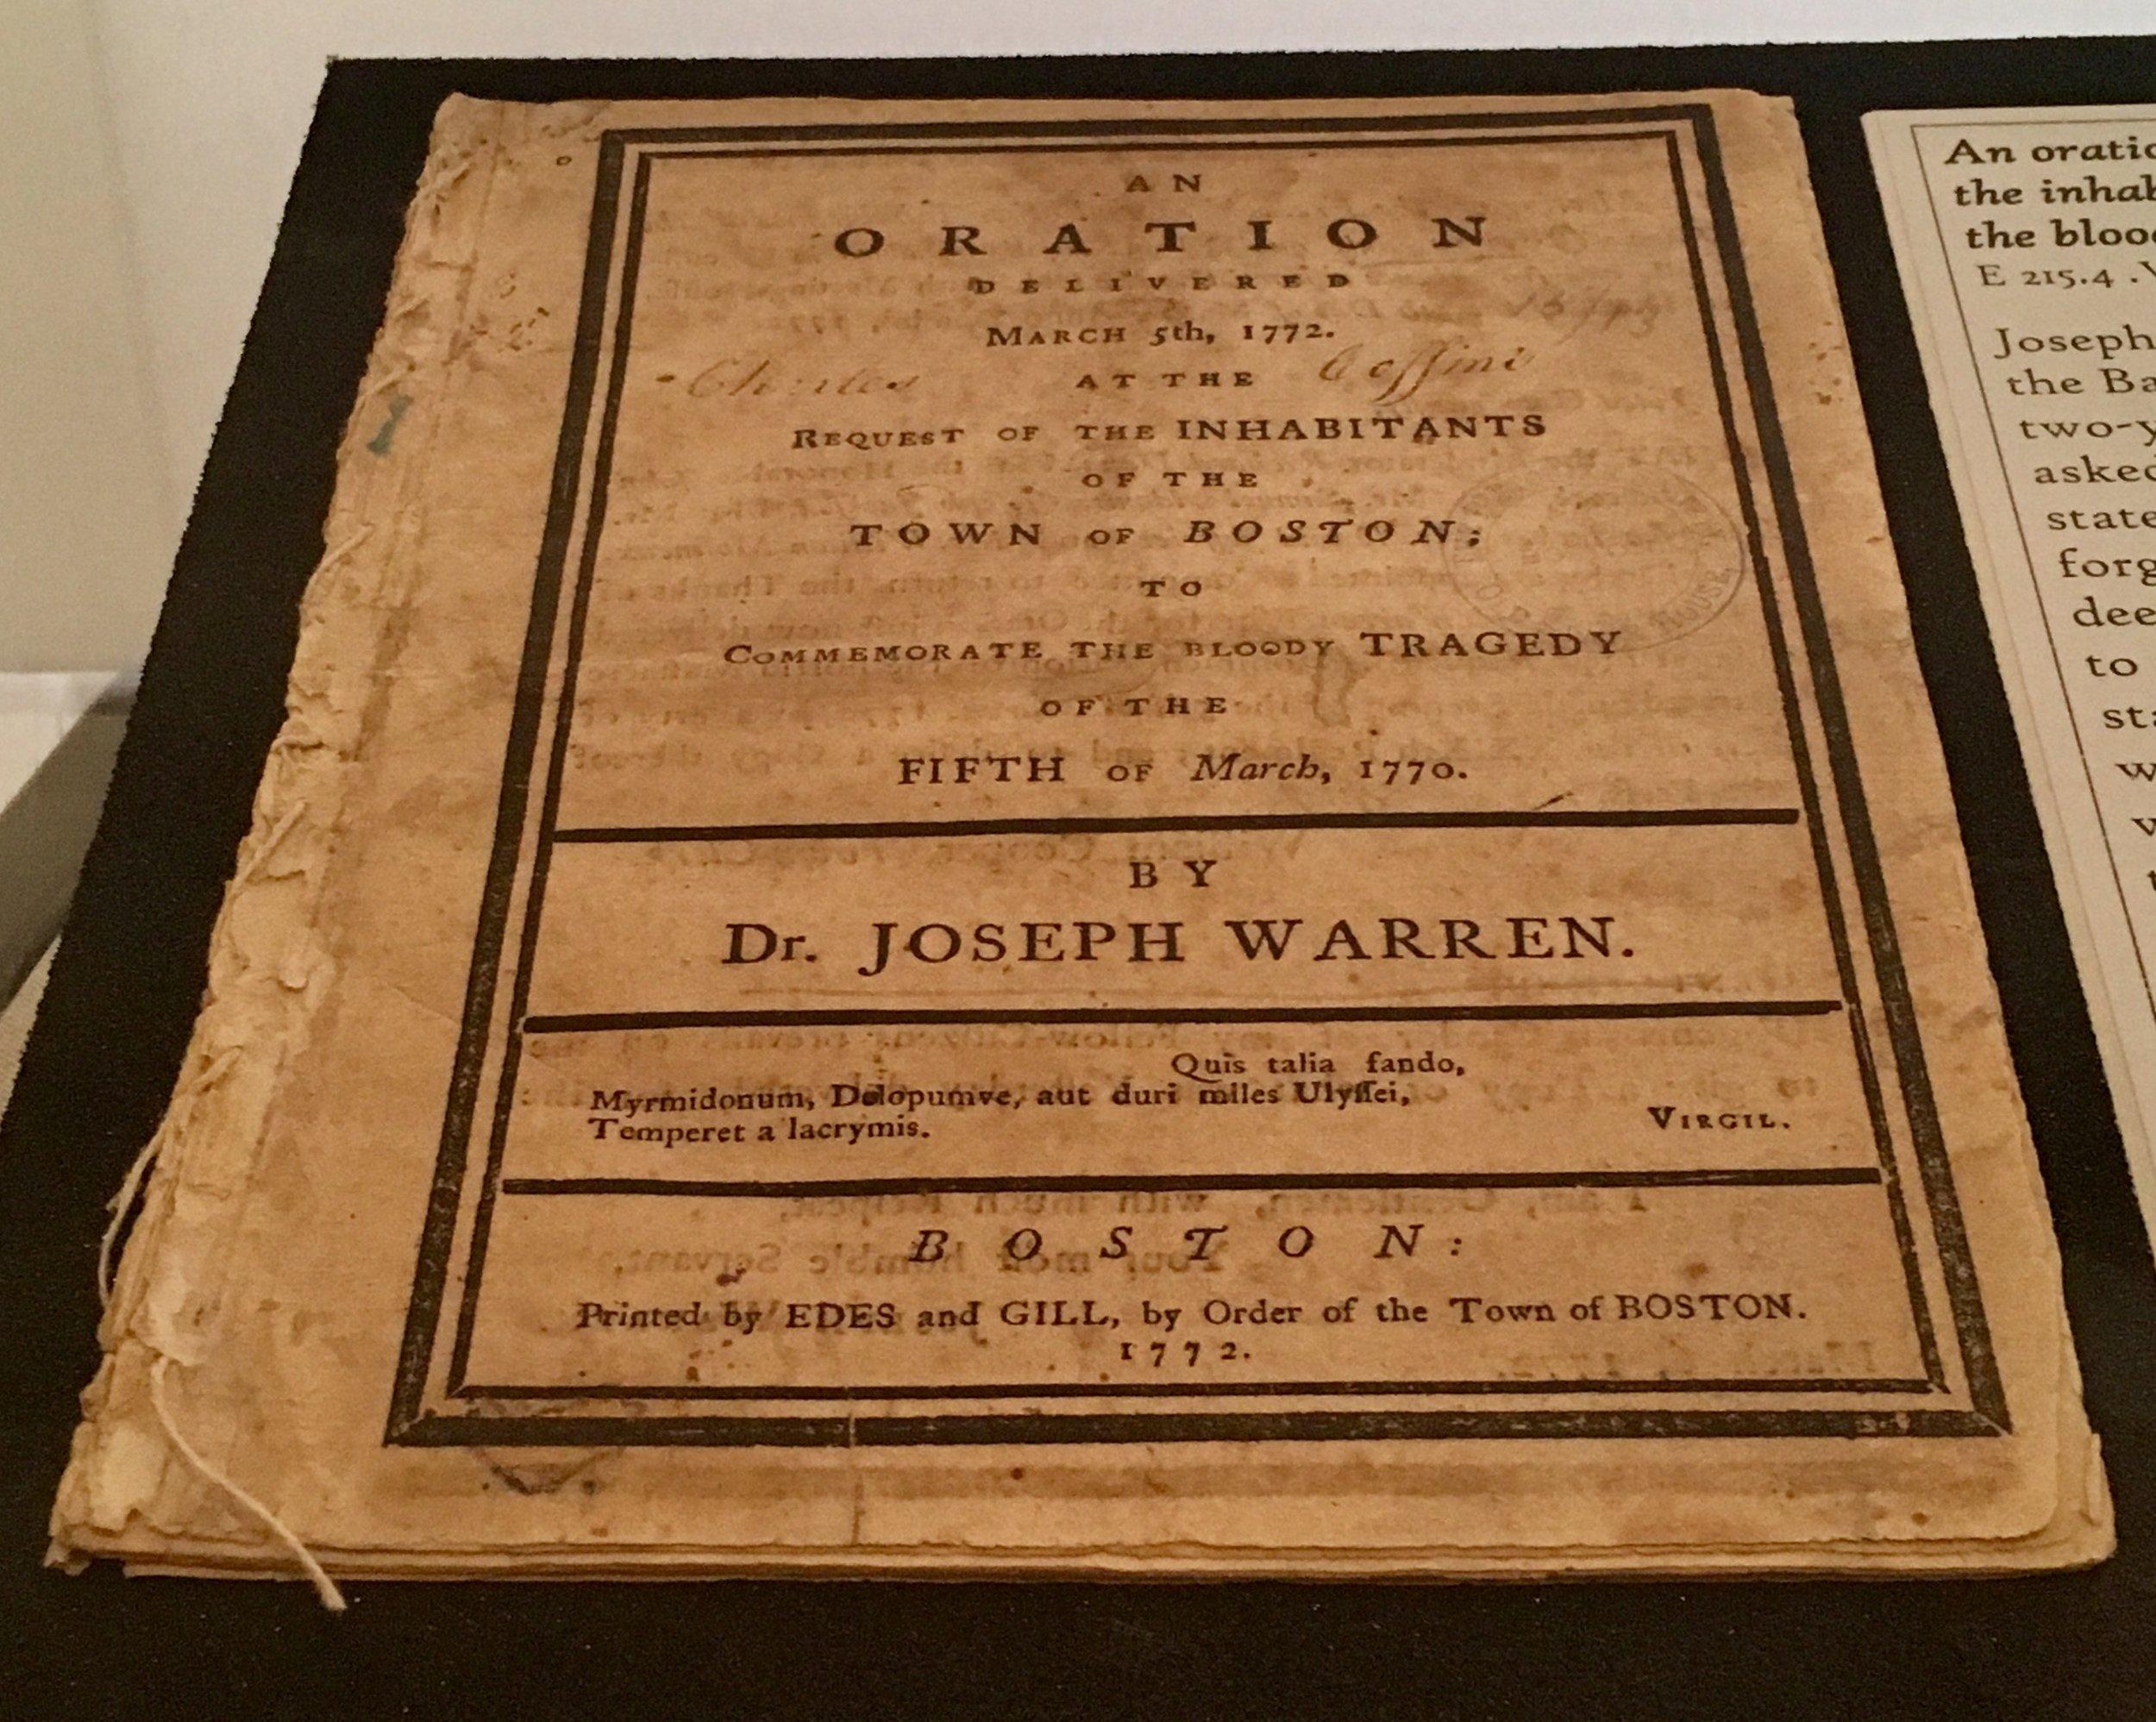 Joseph Warren's sermon on display (E 215.4 .W28)